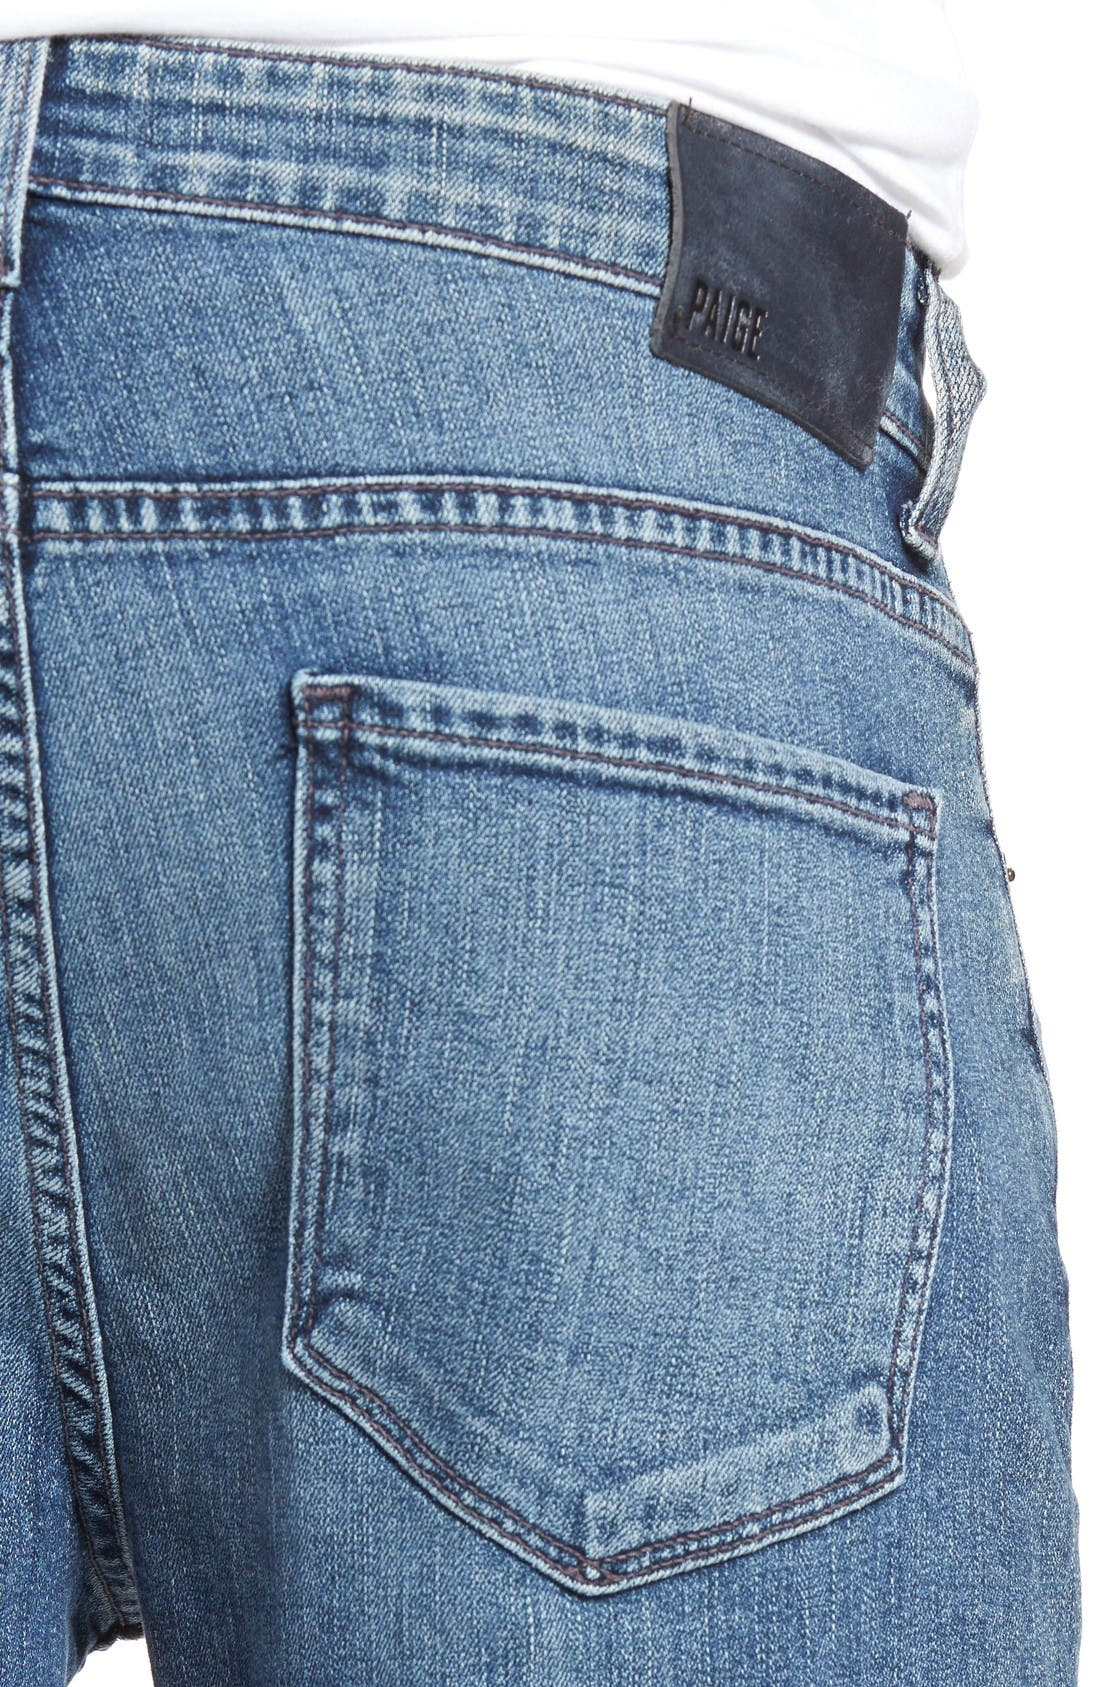 Normandie Straight Leg Jeans,                             Alternate thumbnail 4, color,                             Gibbs